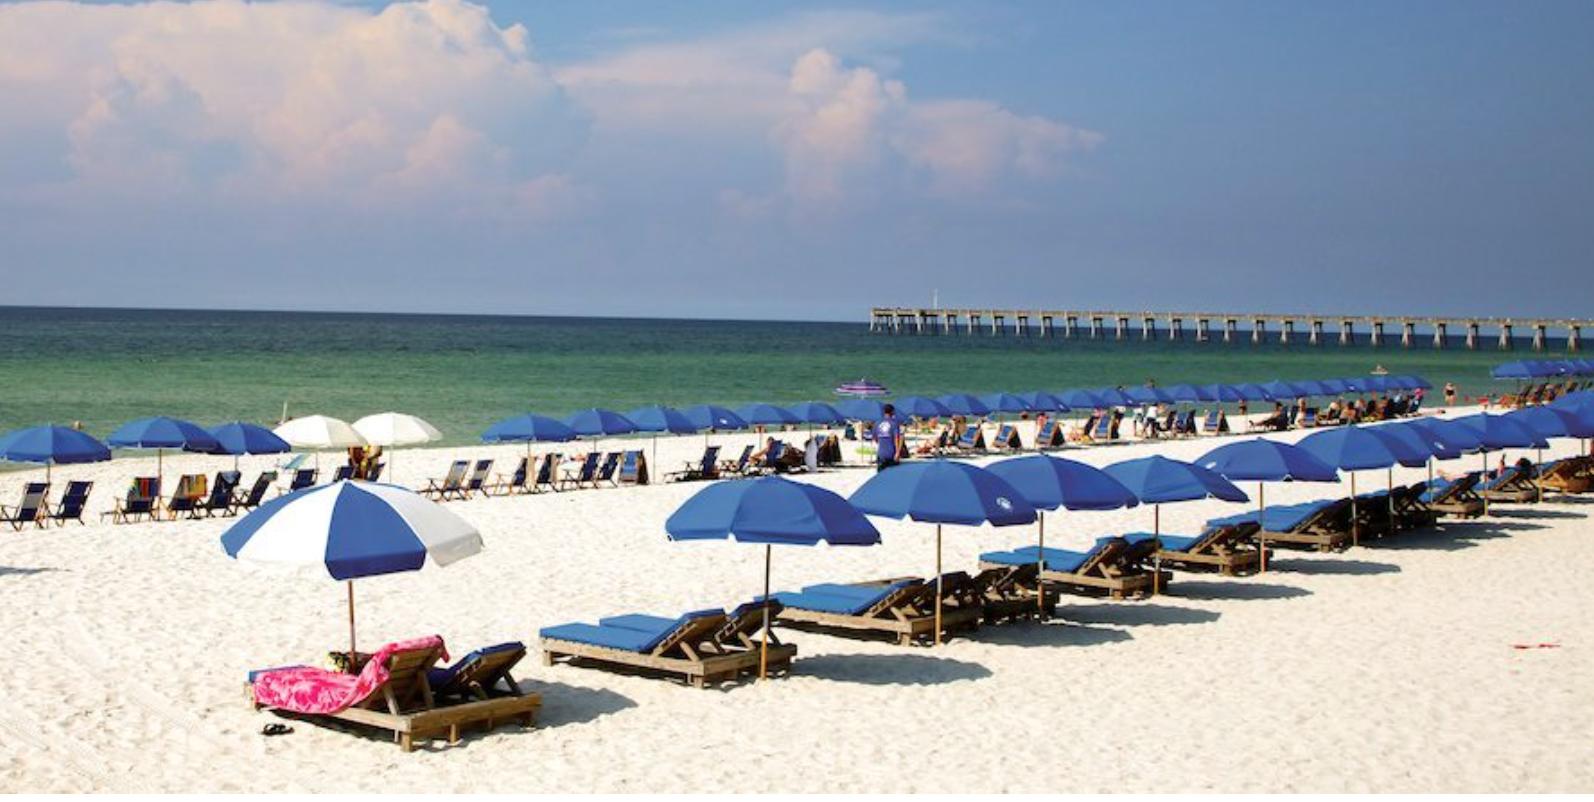 City guide to Pensacola - Darling